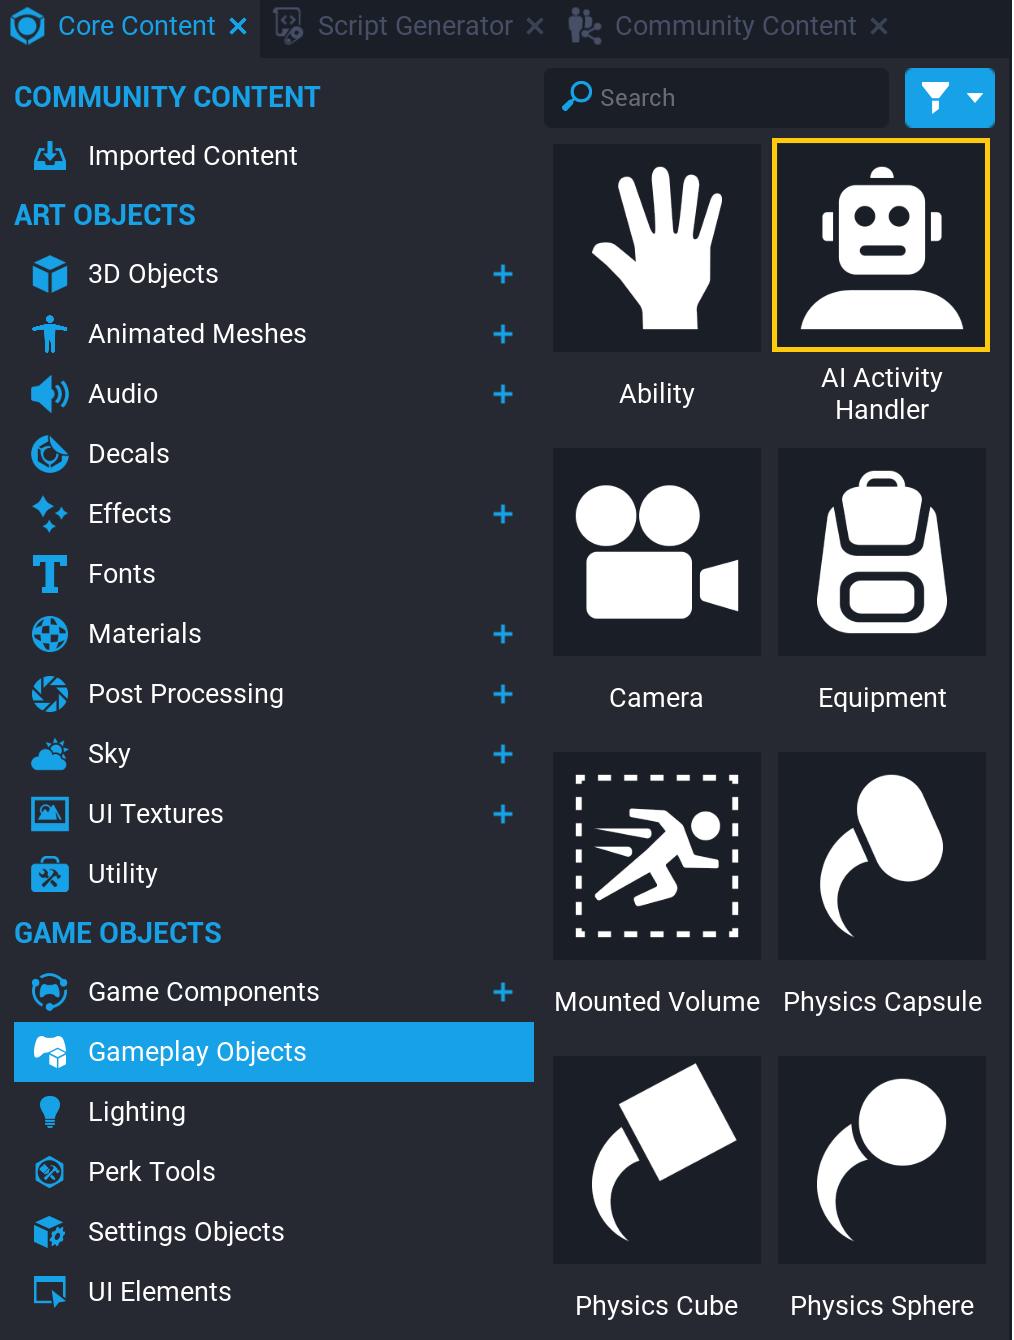 AI Activity Handler in Core Content